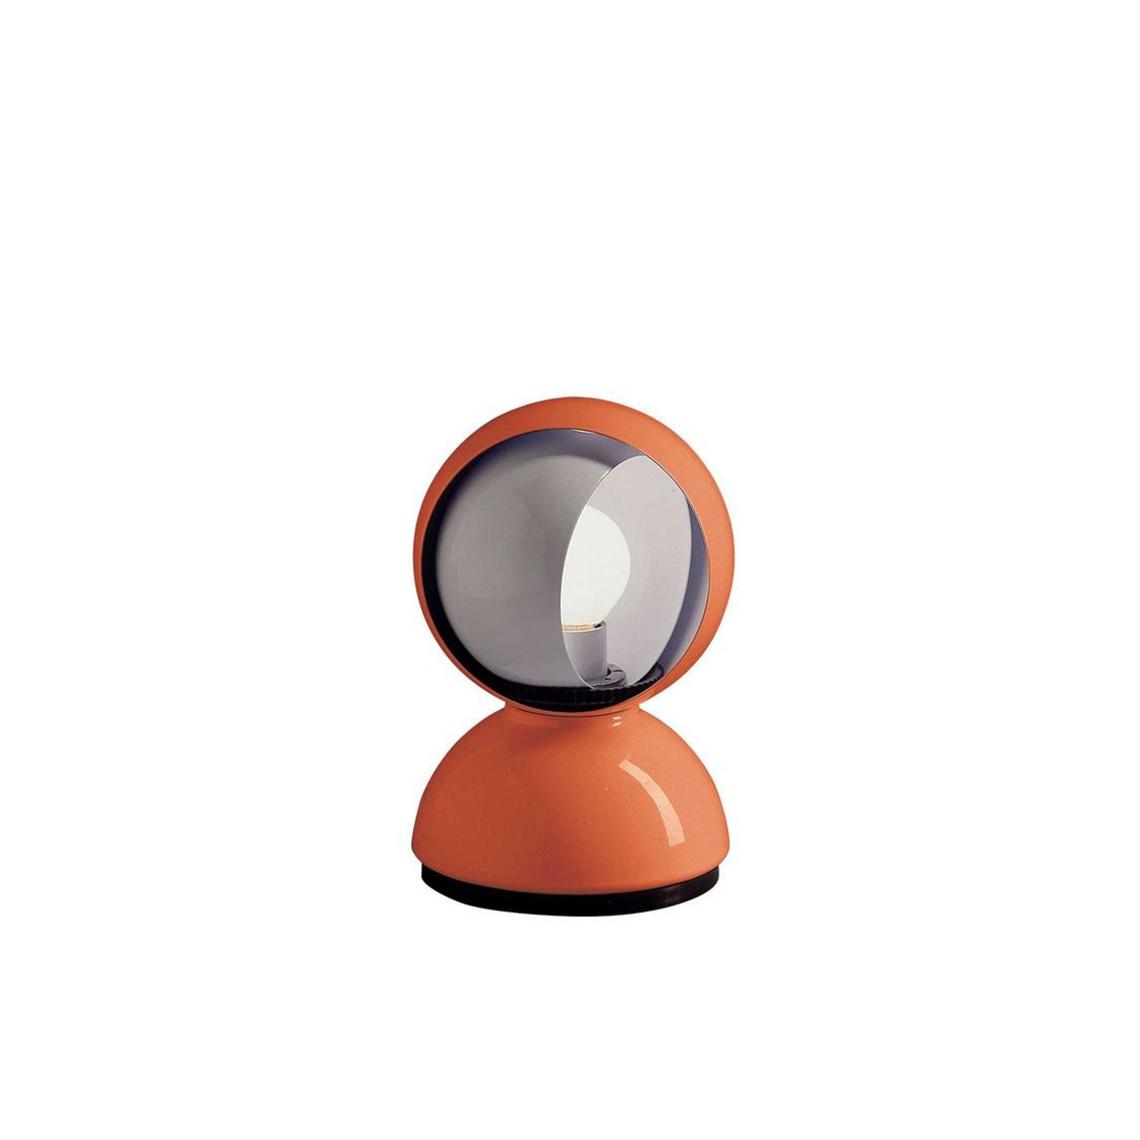 Eclisse Bords/Vägglampa Orange